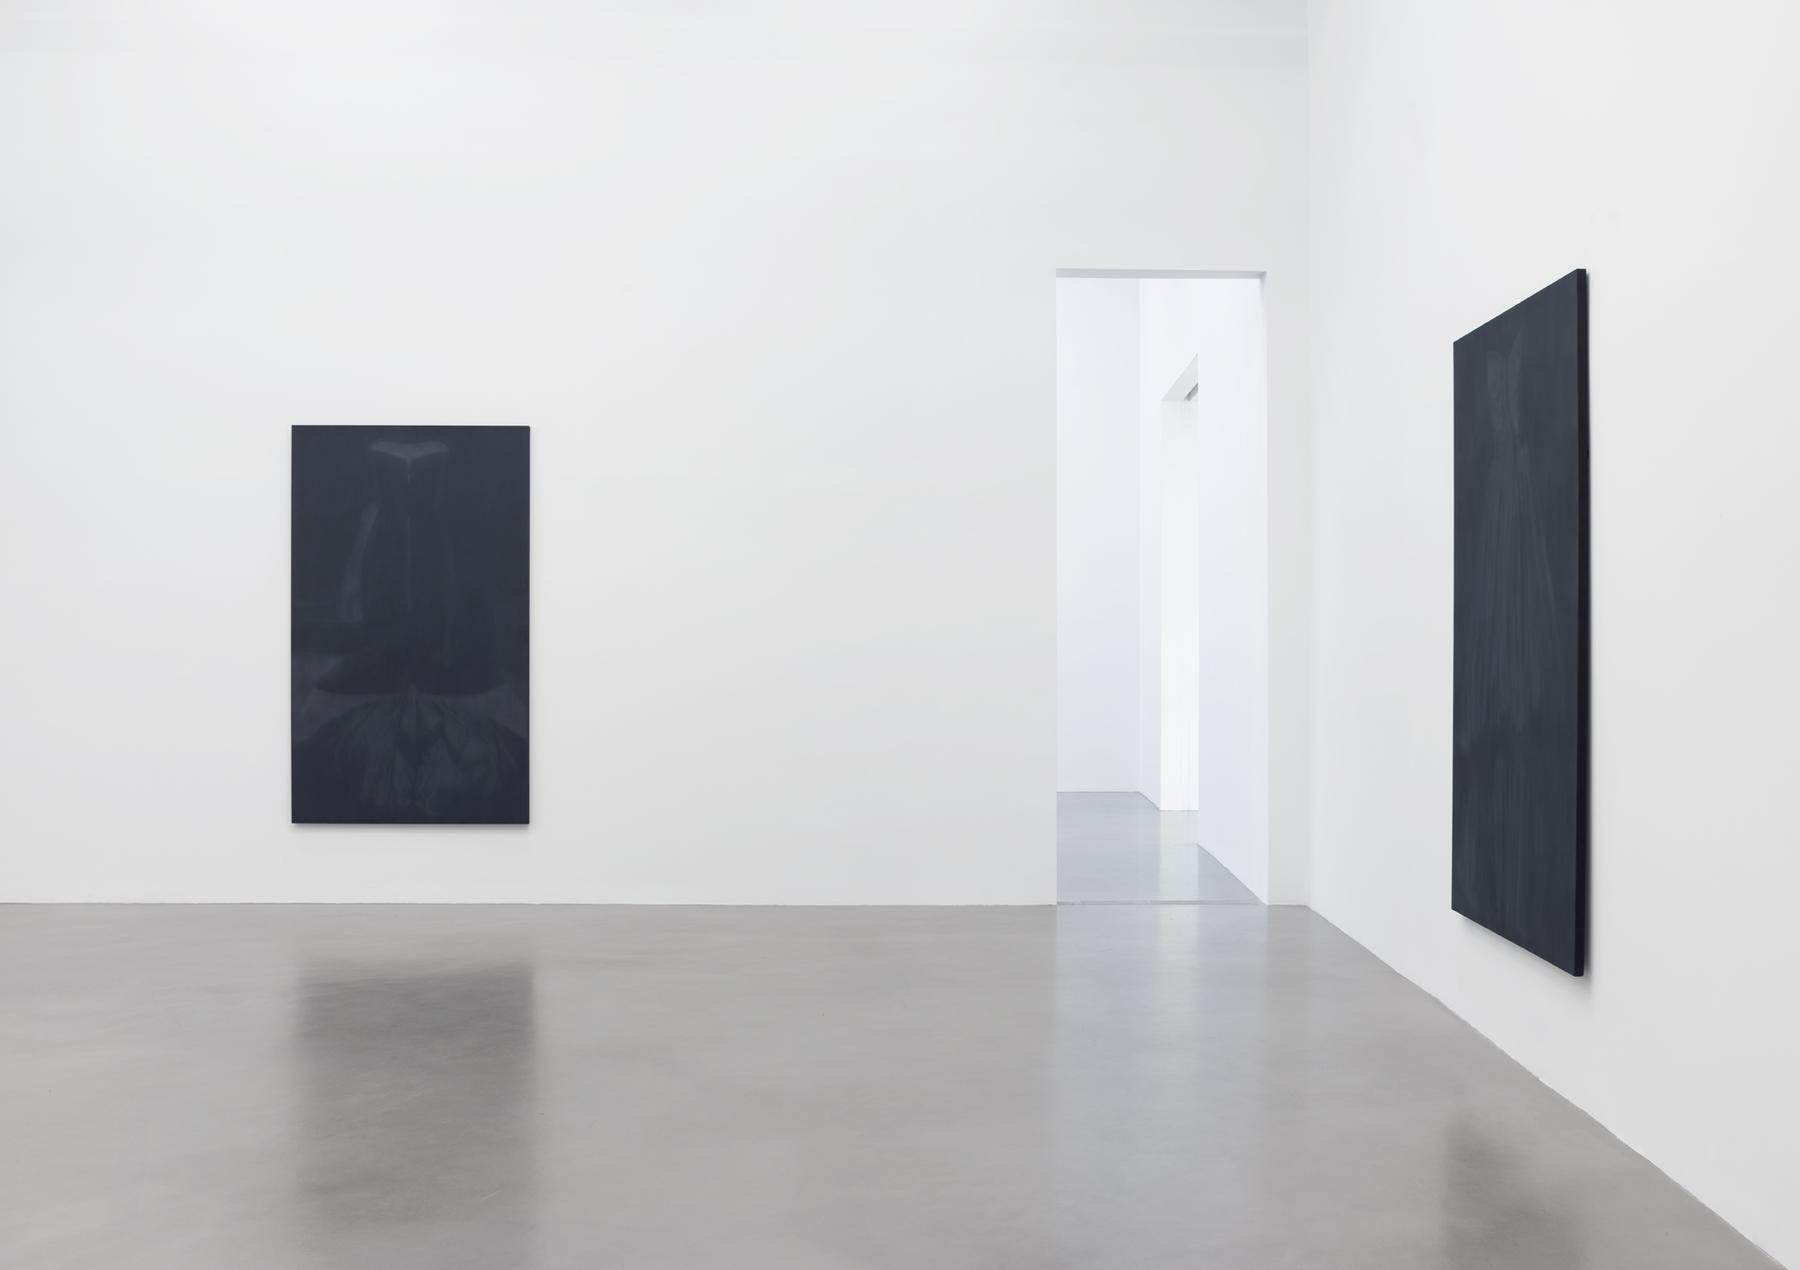 Troy Brauntuch Installation view 5